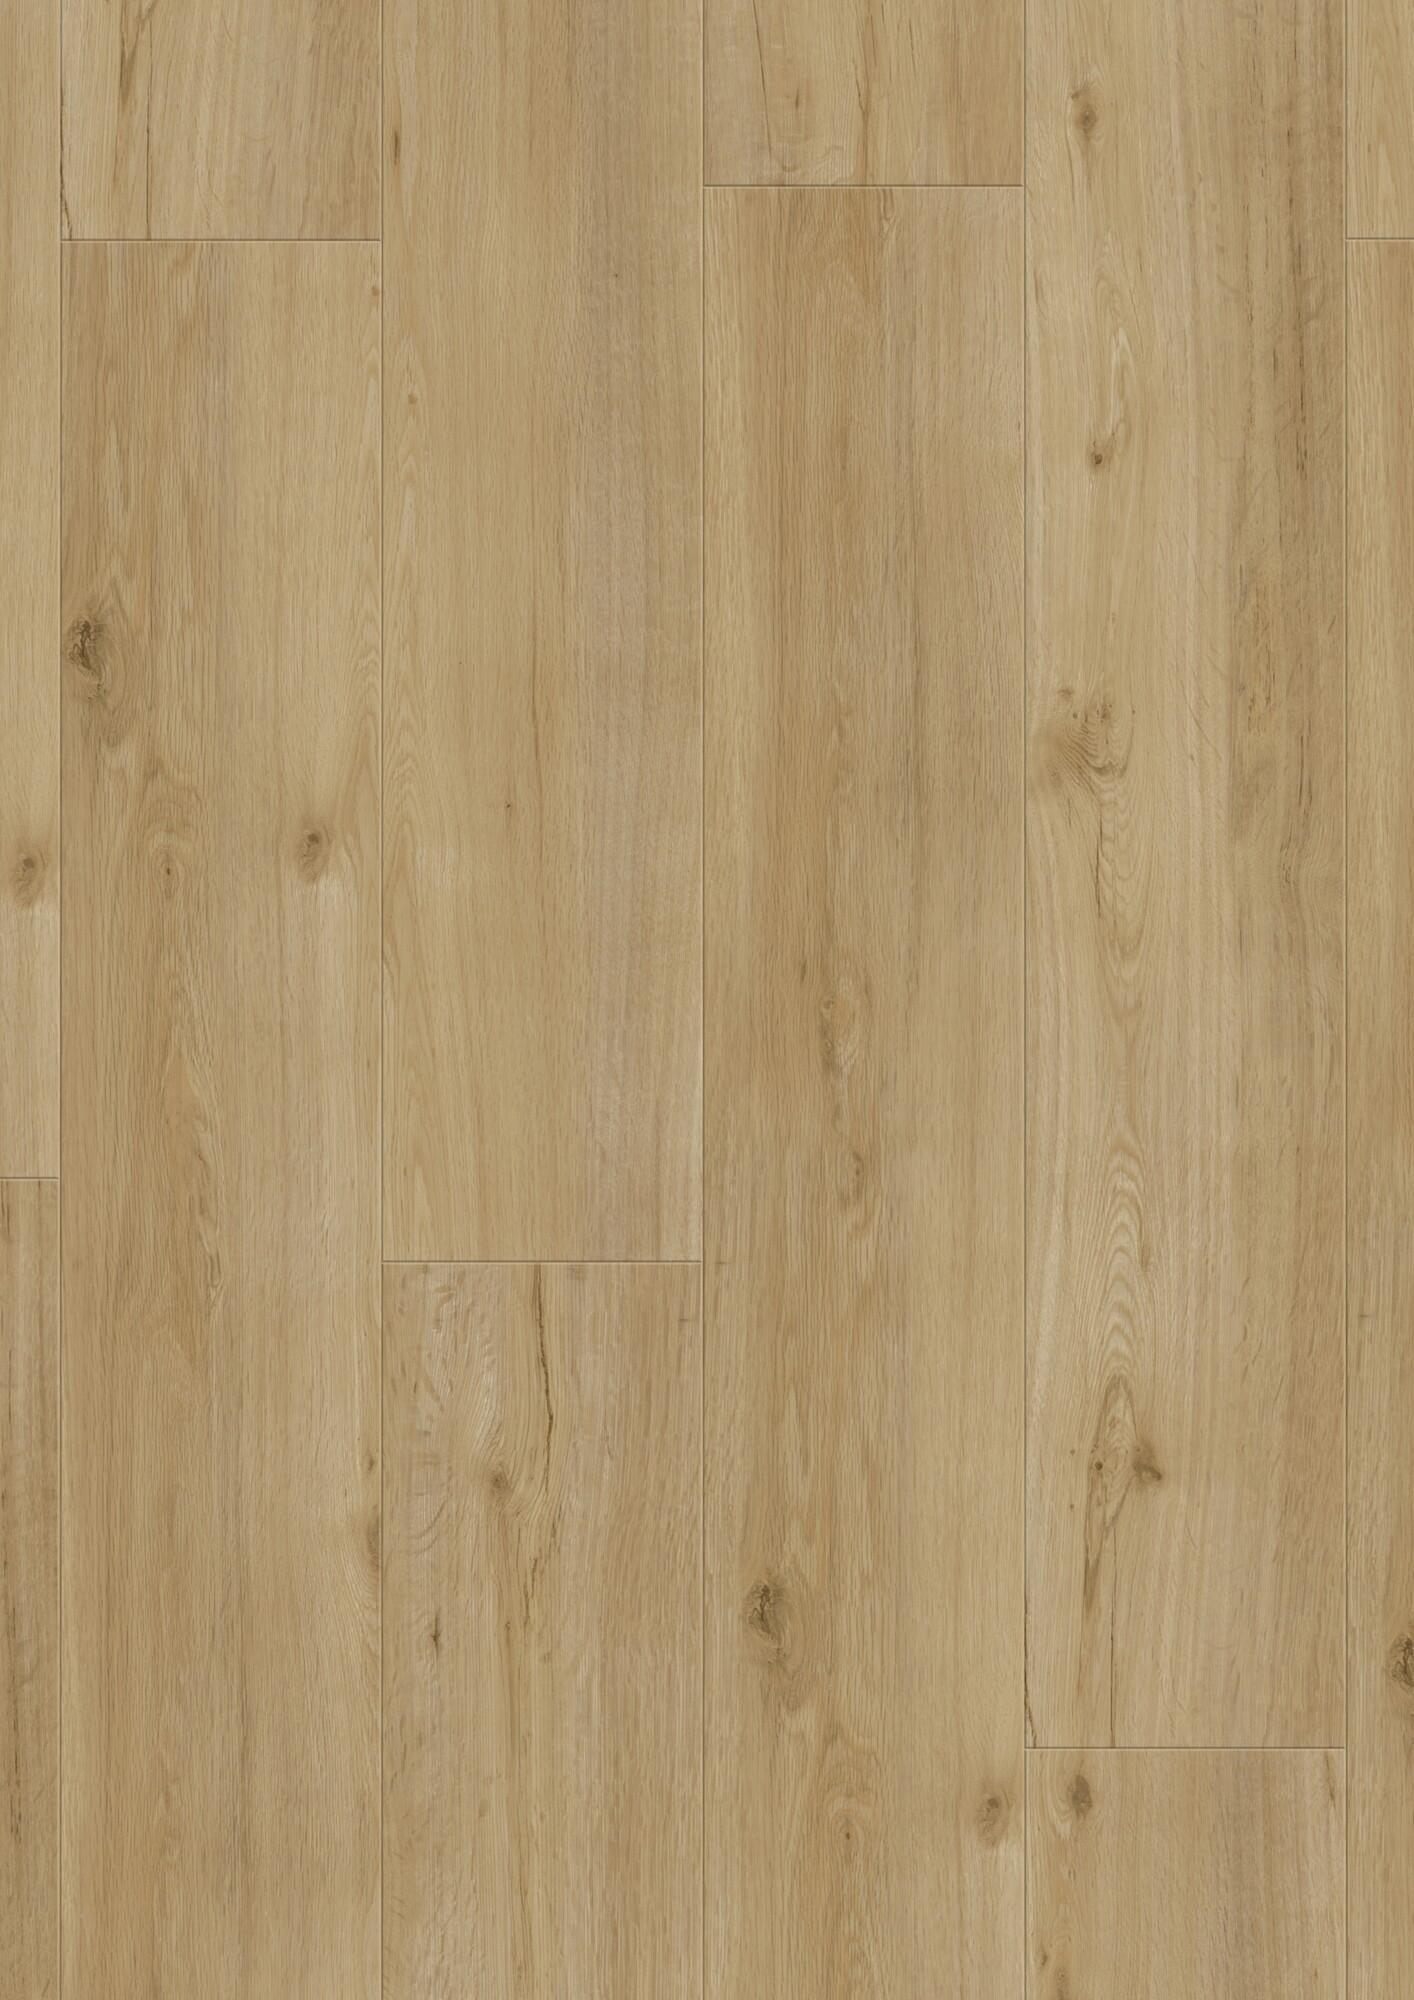 Pavimento PVC flottante clic+ Senso Premium Columbia Sp 4.5 mm giallo / dorato - 6